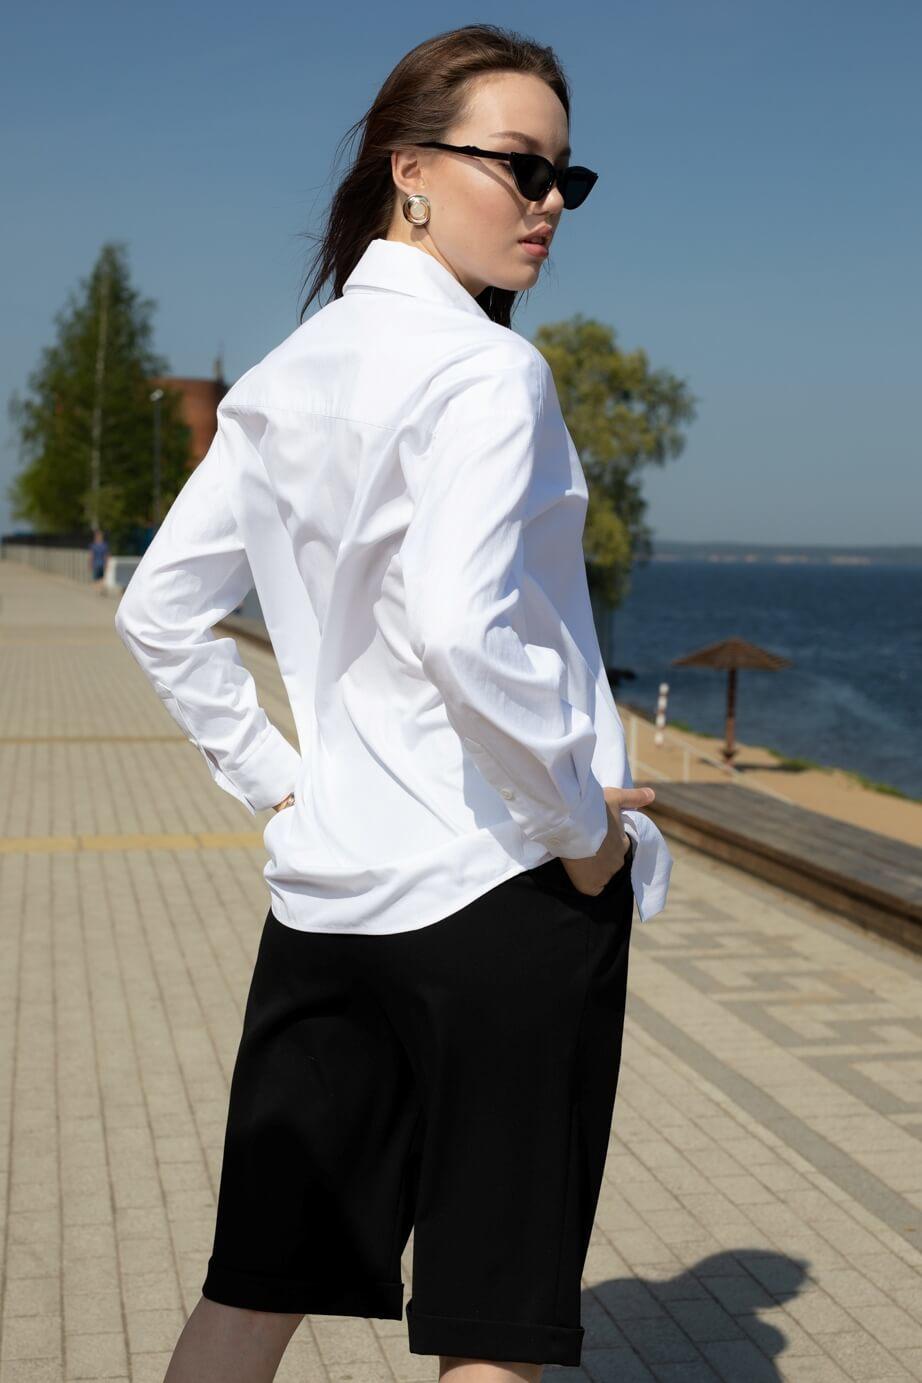 Рубашка мужского кроя с карманом